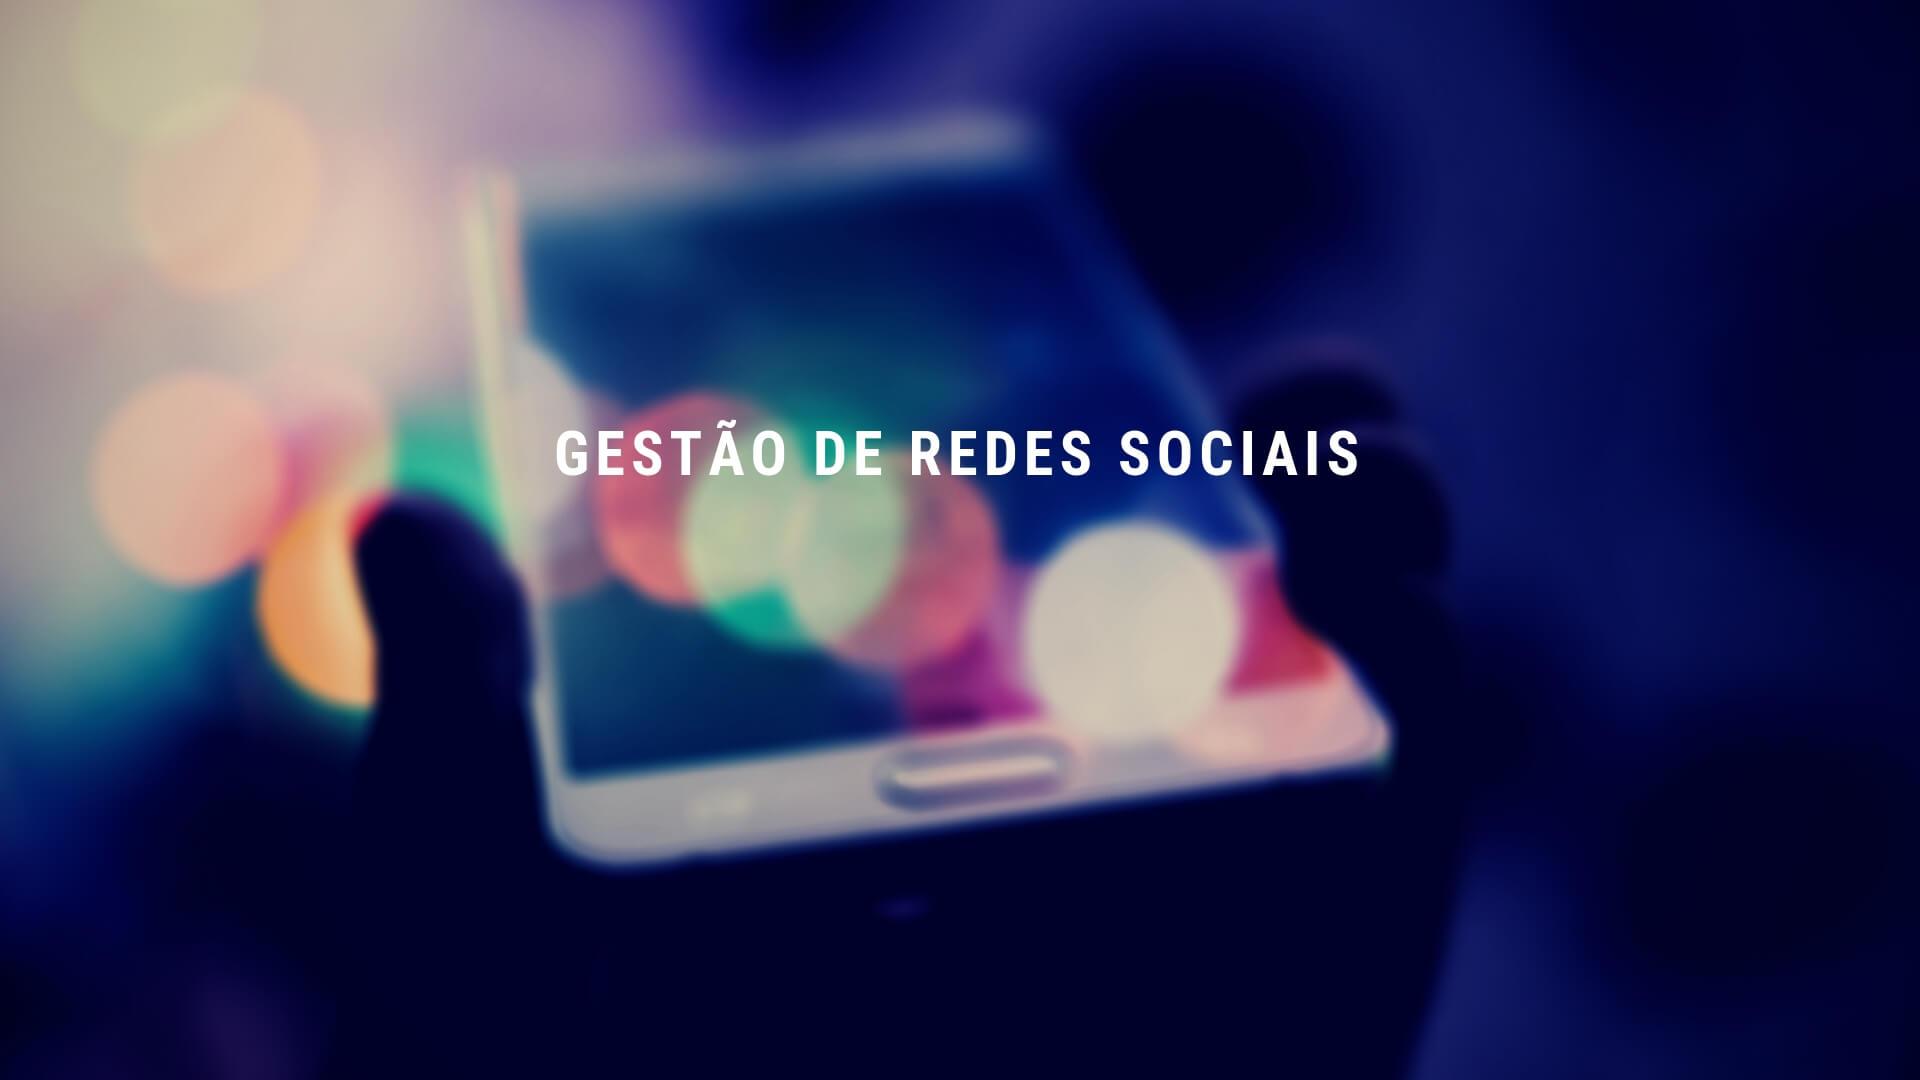 redes-gestao-de-redes-sociais